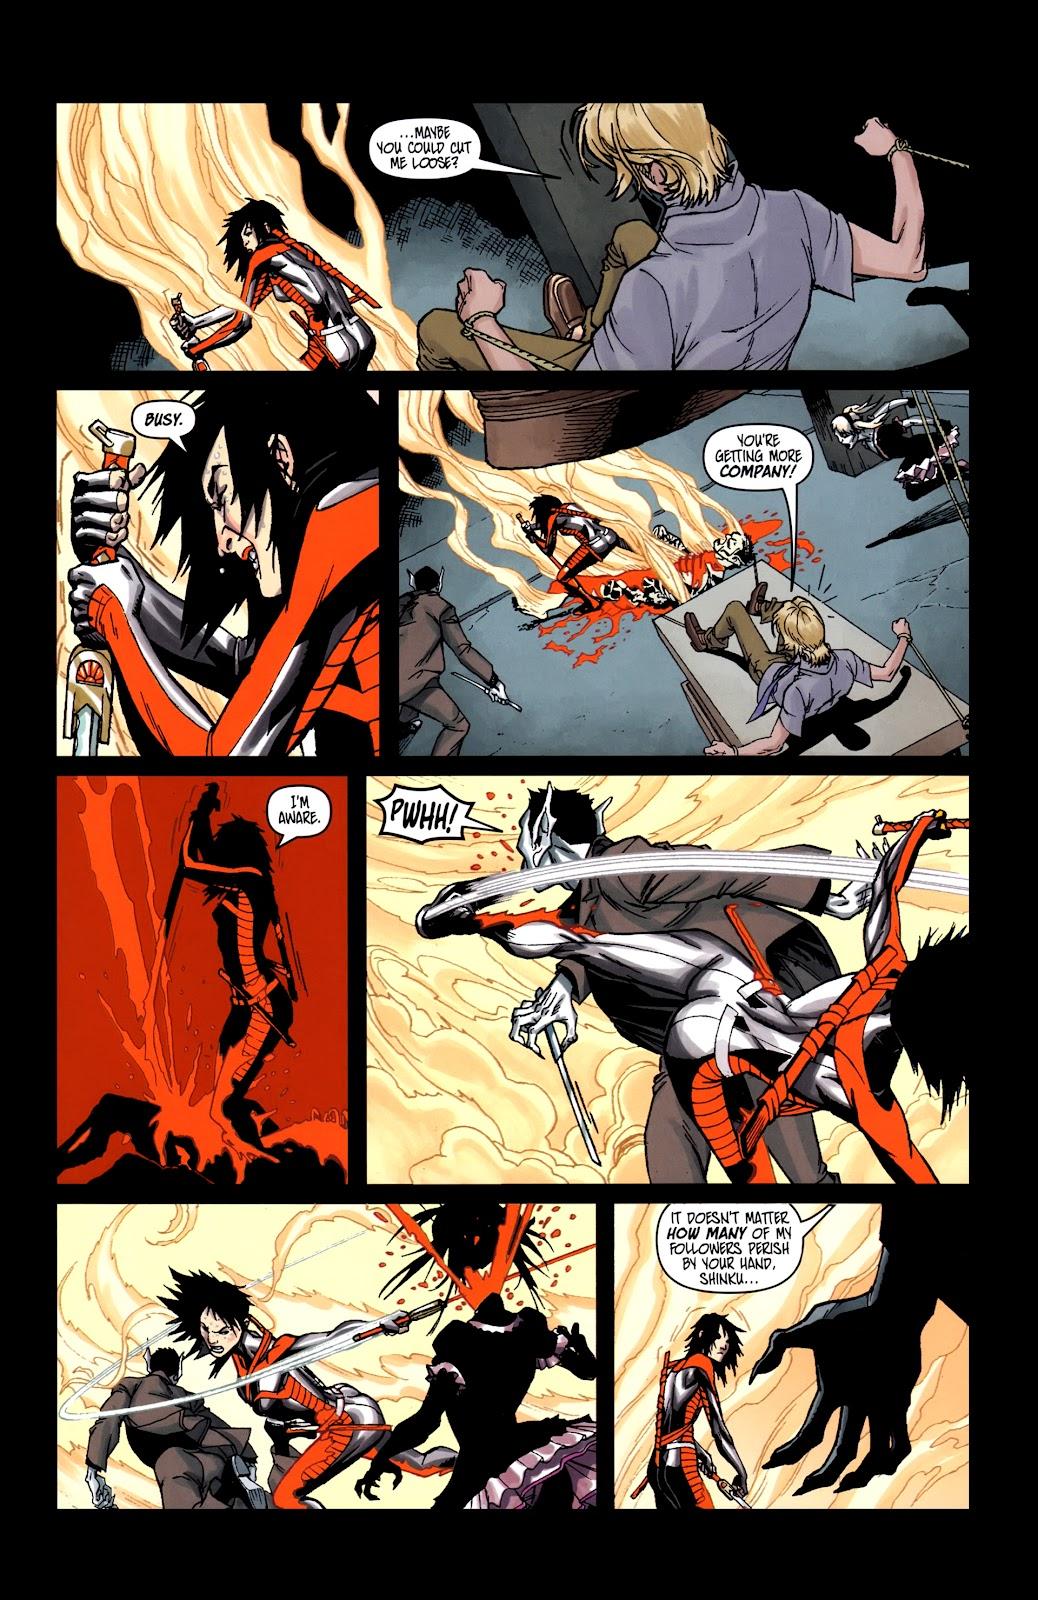 Read online Shinku comic -  Issue #5 - 16